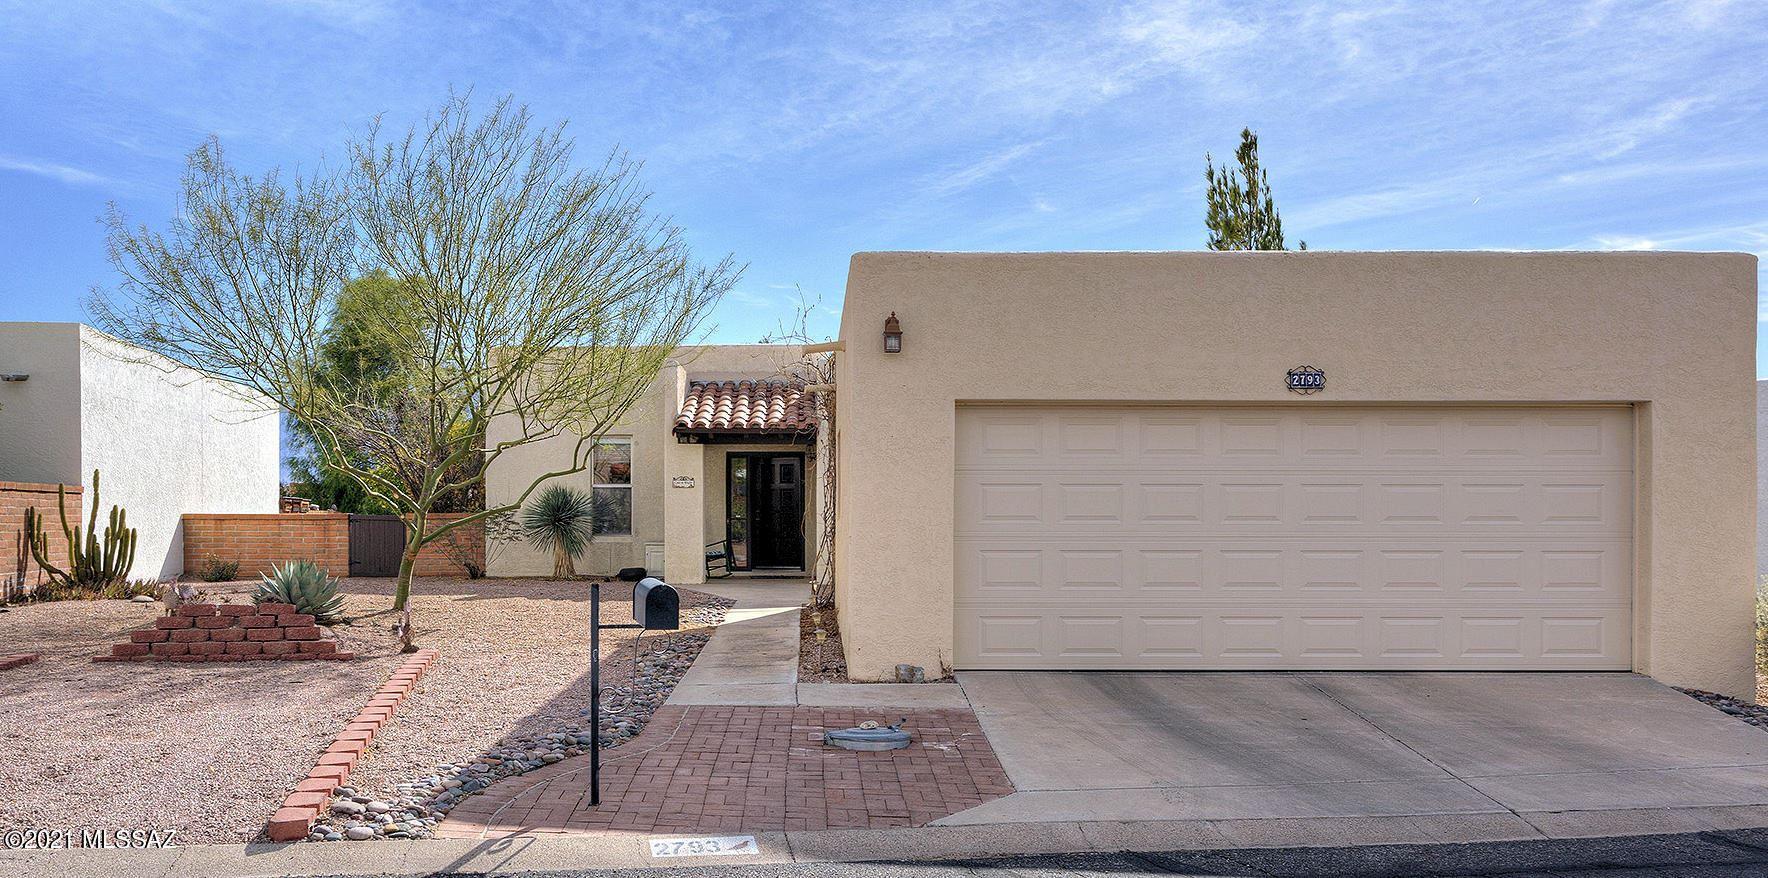 2793 S Placita Rustica, Green Valley, AZ 85622 - MLS#: 22101516